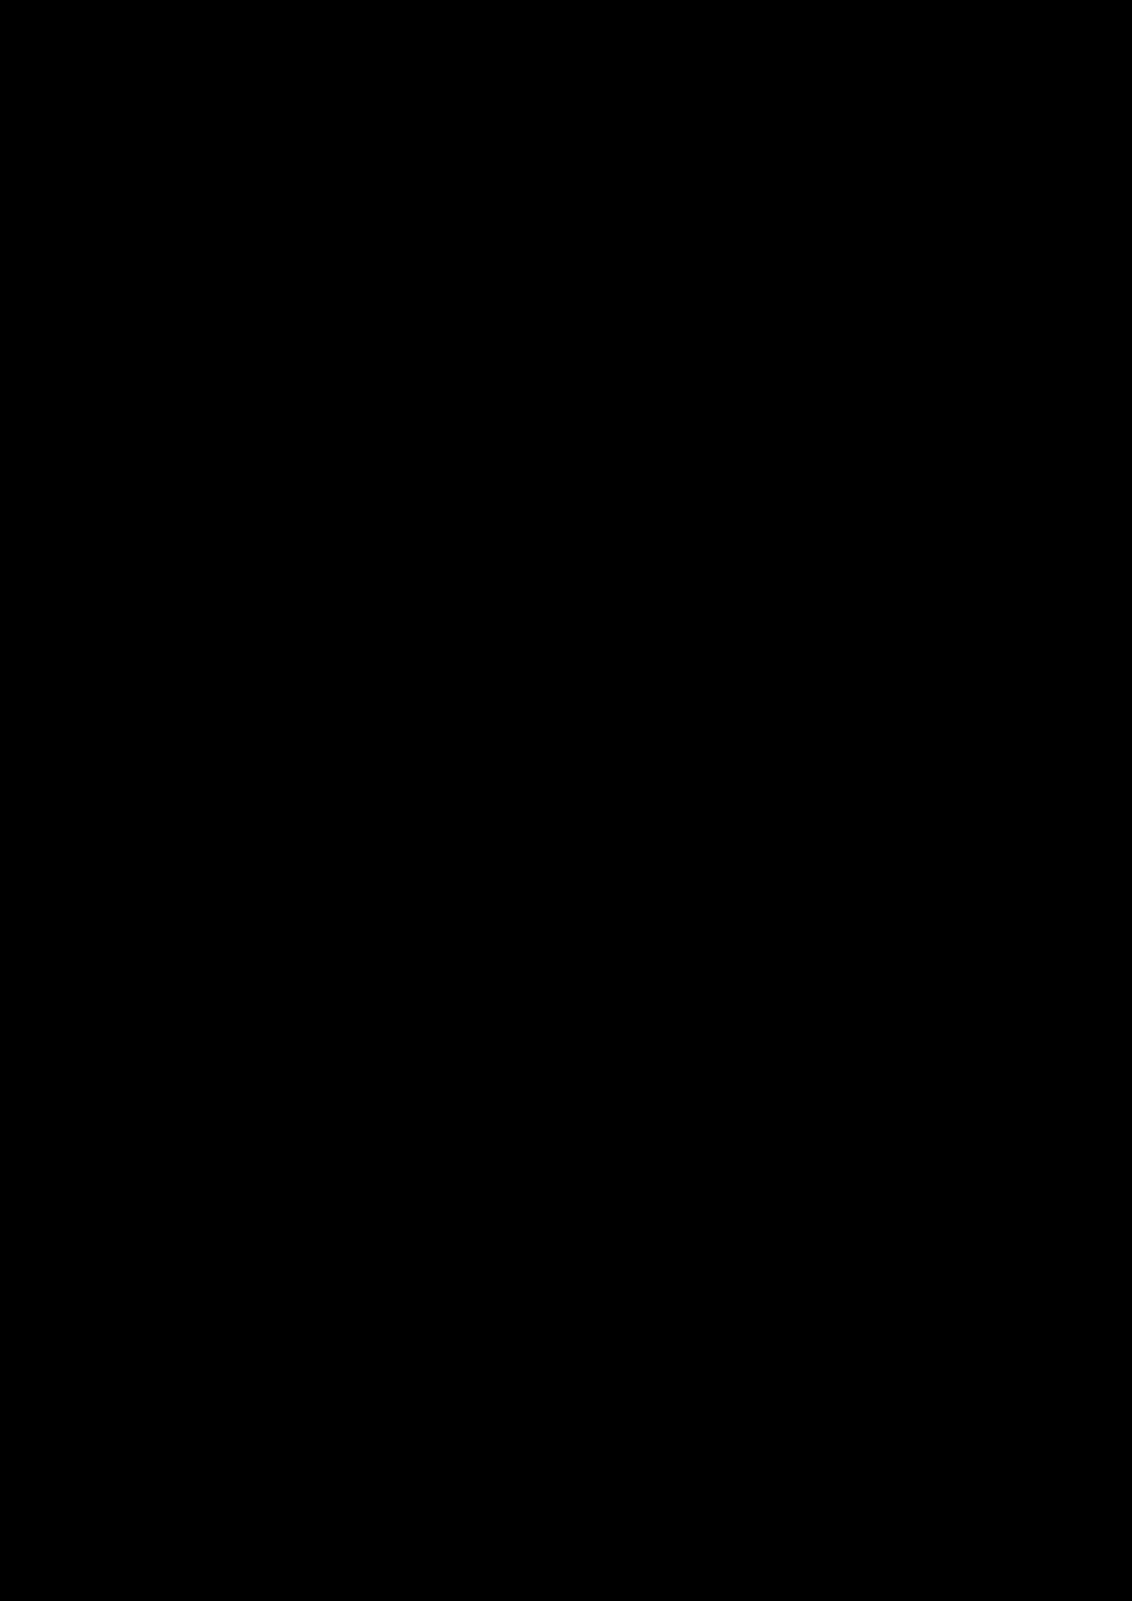 Romans o sleze slide, Image 37